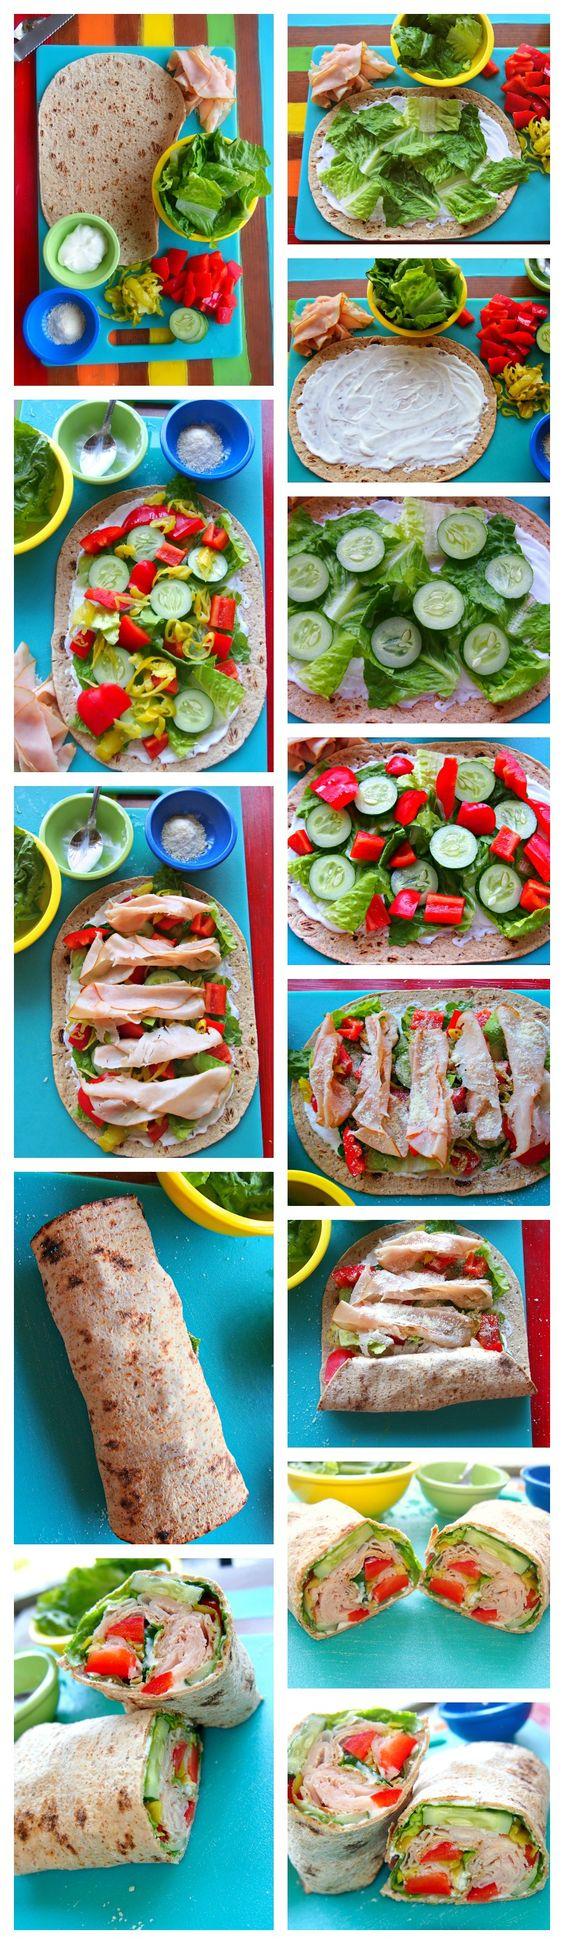 Vegetariana Turquia Enrole. / Vegetarian Turkey Wrap.